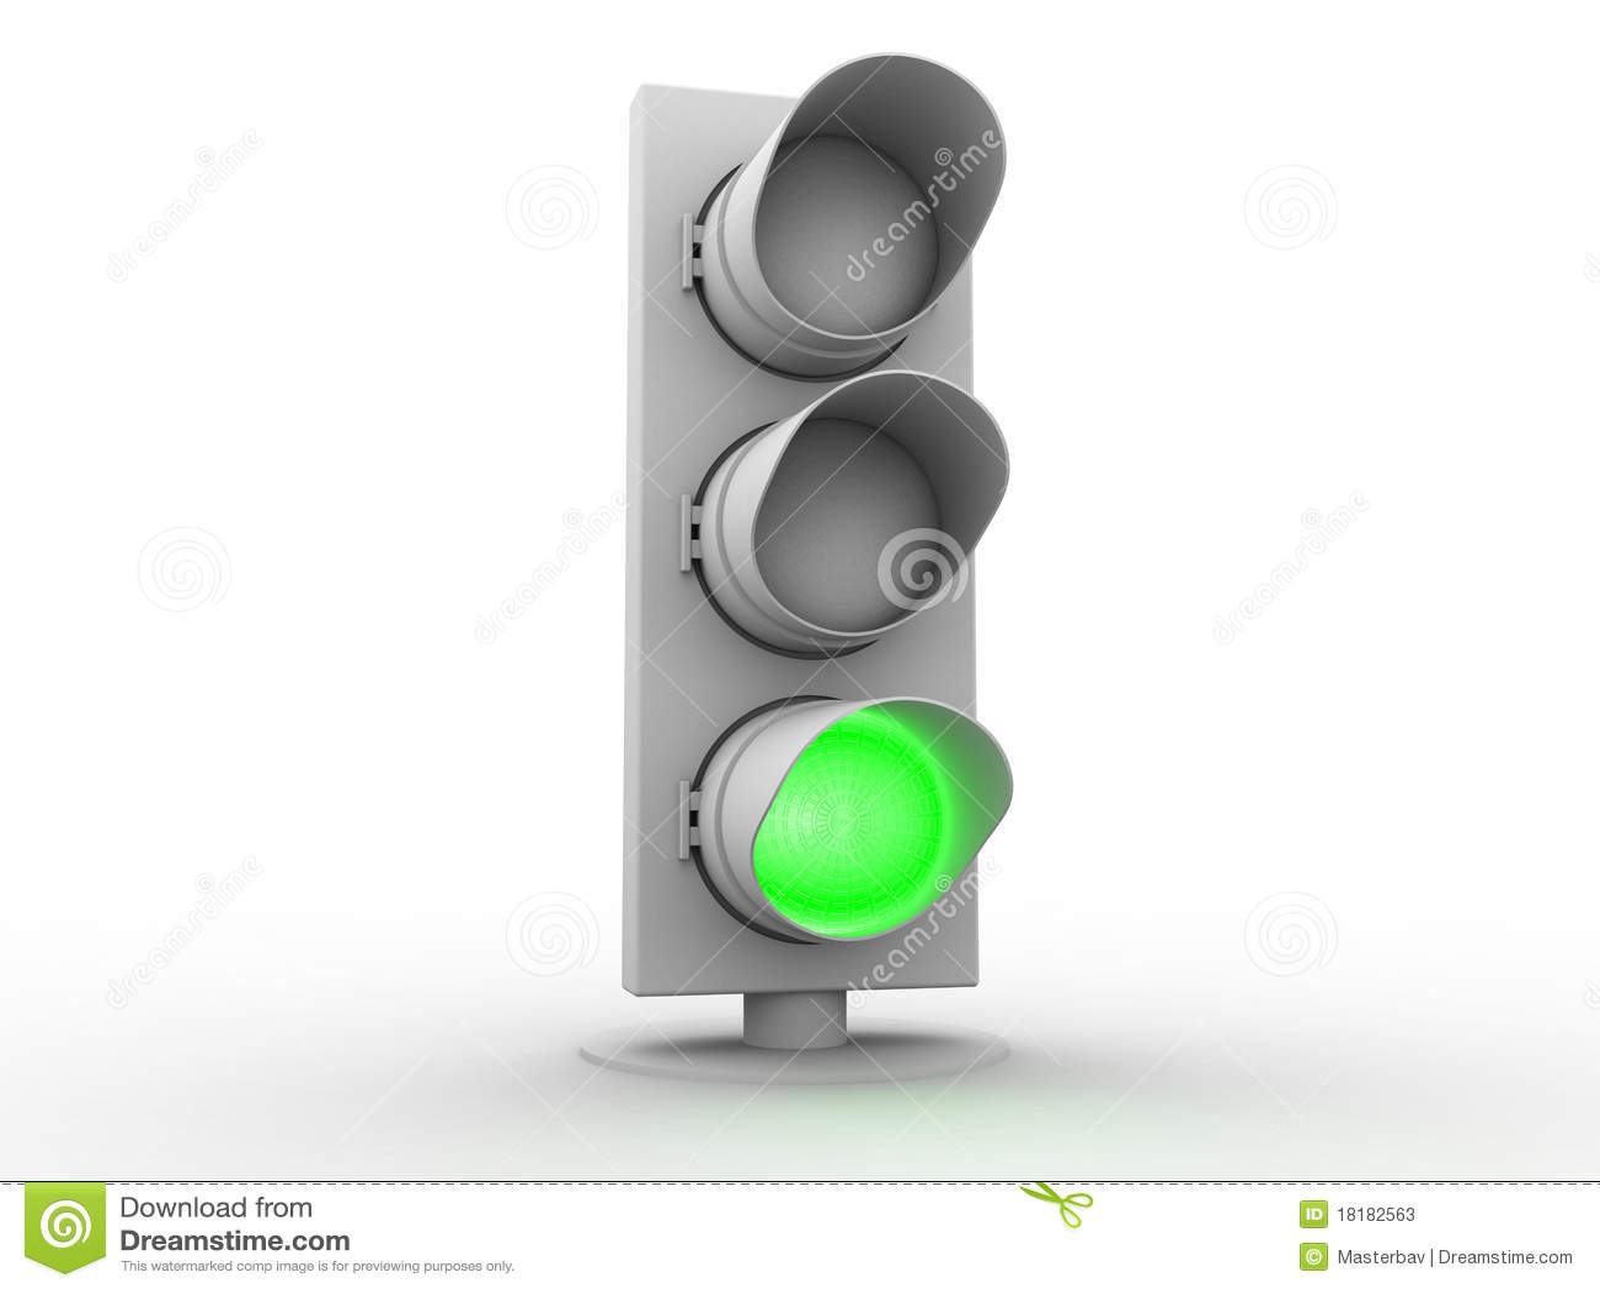 Speaker Met Licht : Jbl pulse bluetooth speaker review nederlands youtube